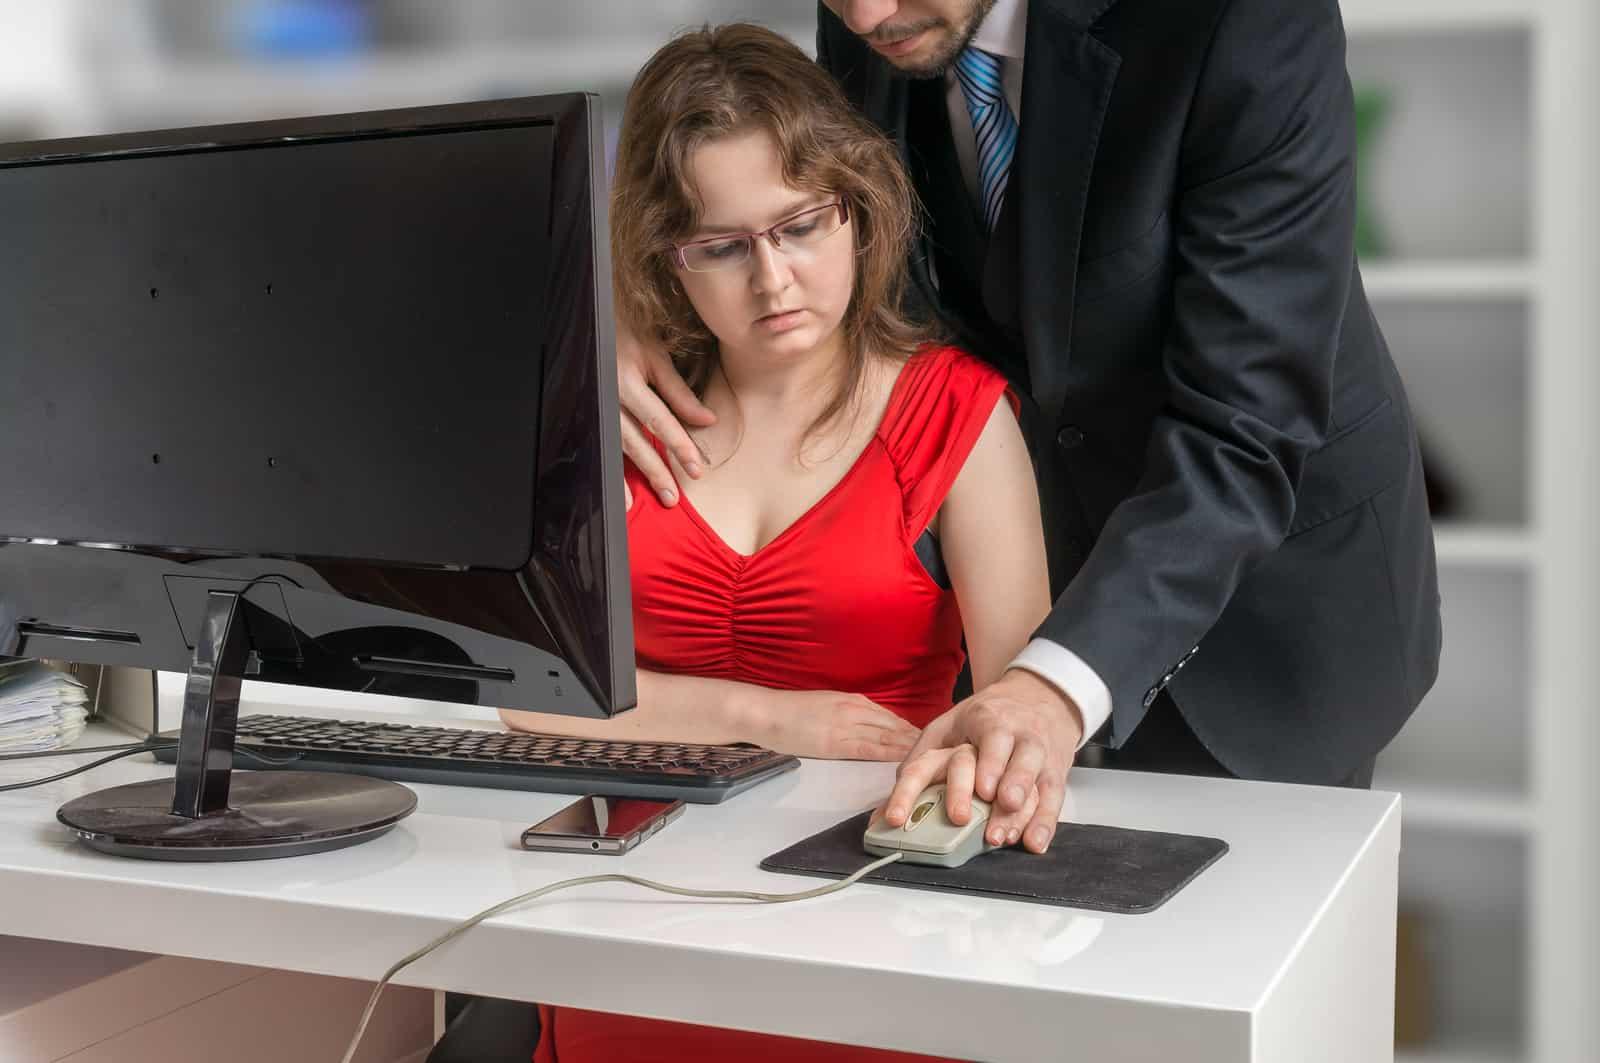 проверка секретарши на профпригодность боссом - 9